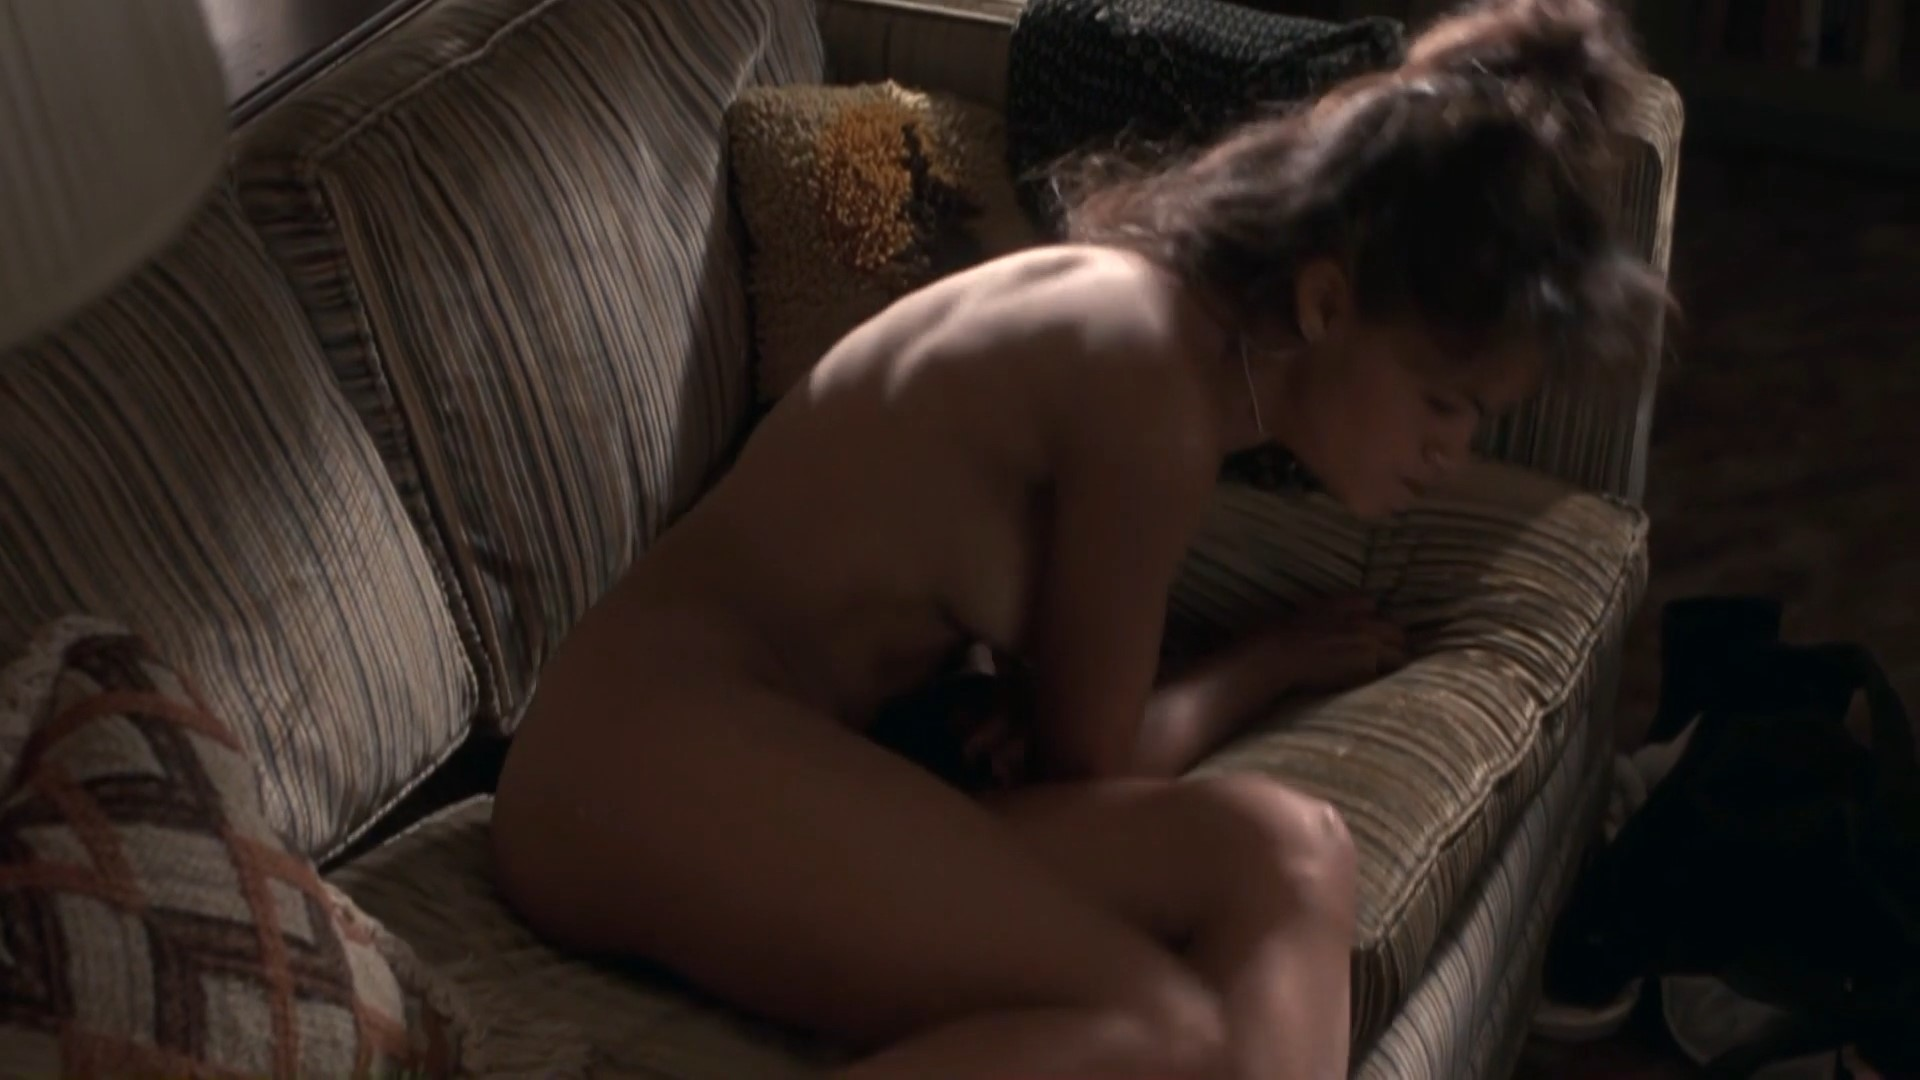 Idea and Karina arroyave nude certainly. Same